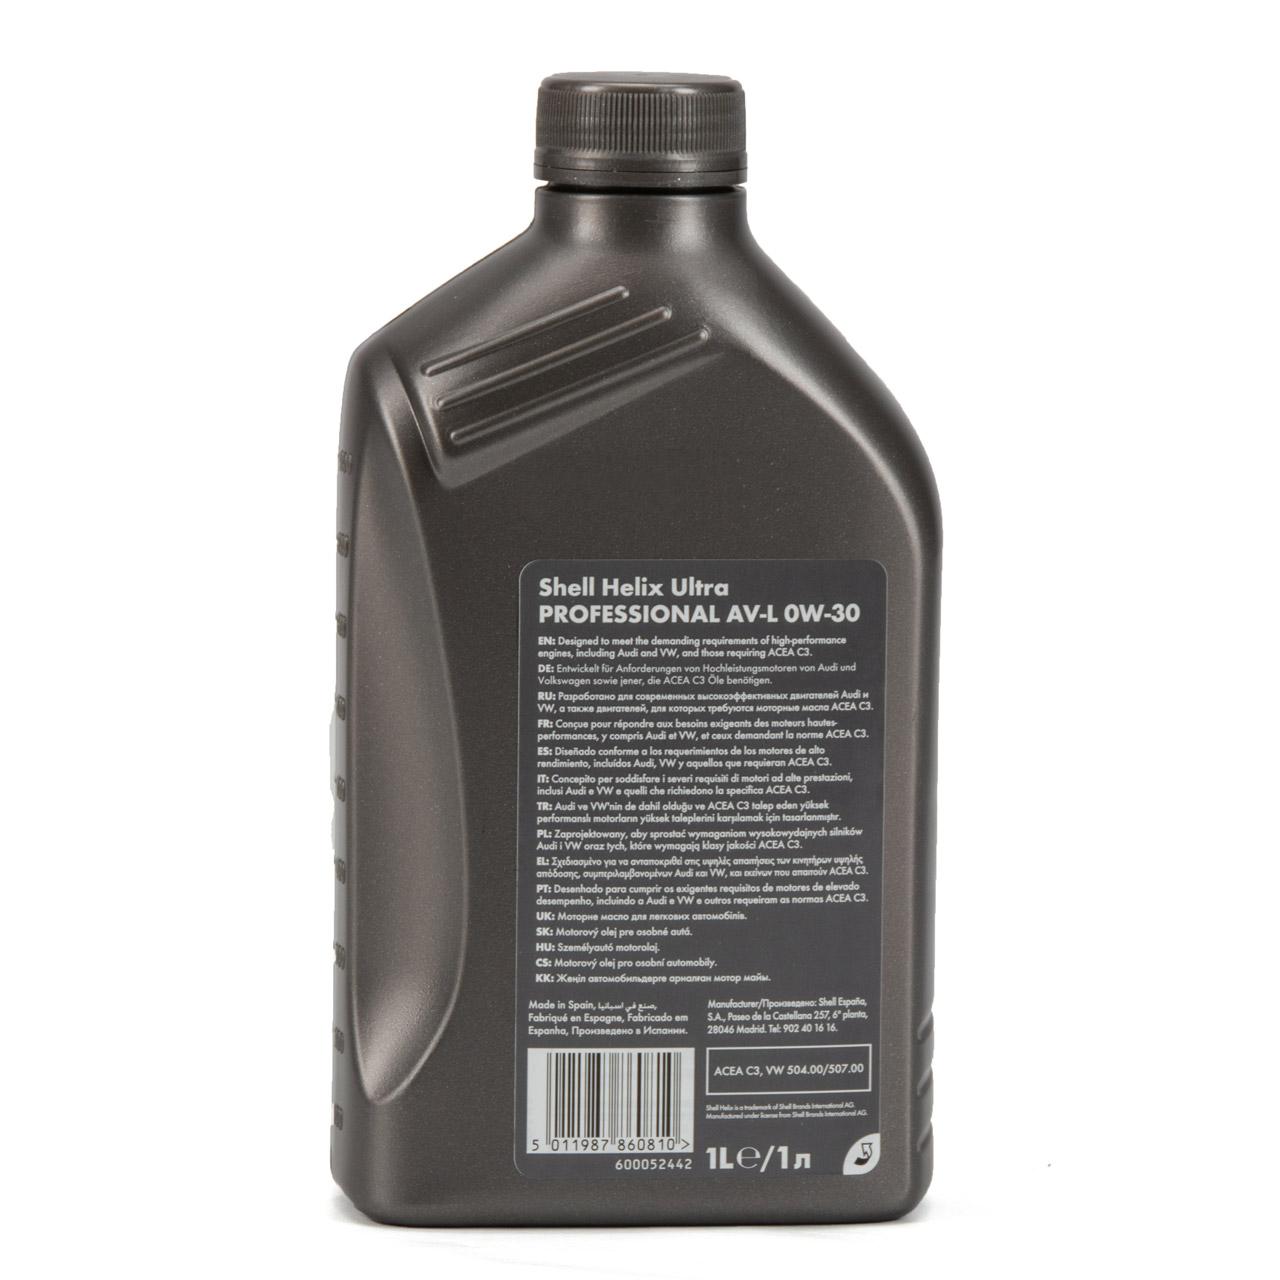 SHELL Motoröl Öl HELIX ULTRA Professional AV-L 0W30 VW 504.00/507.00 - 1 Liter